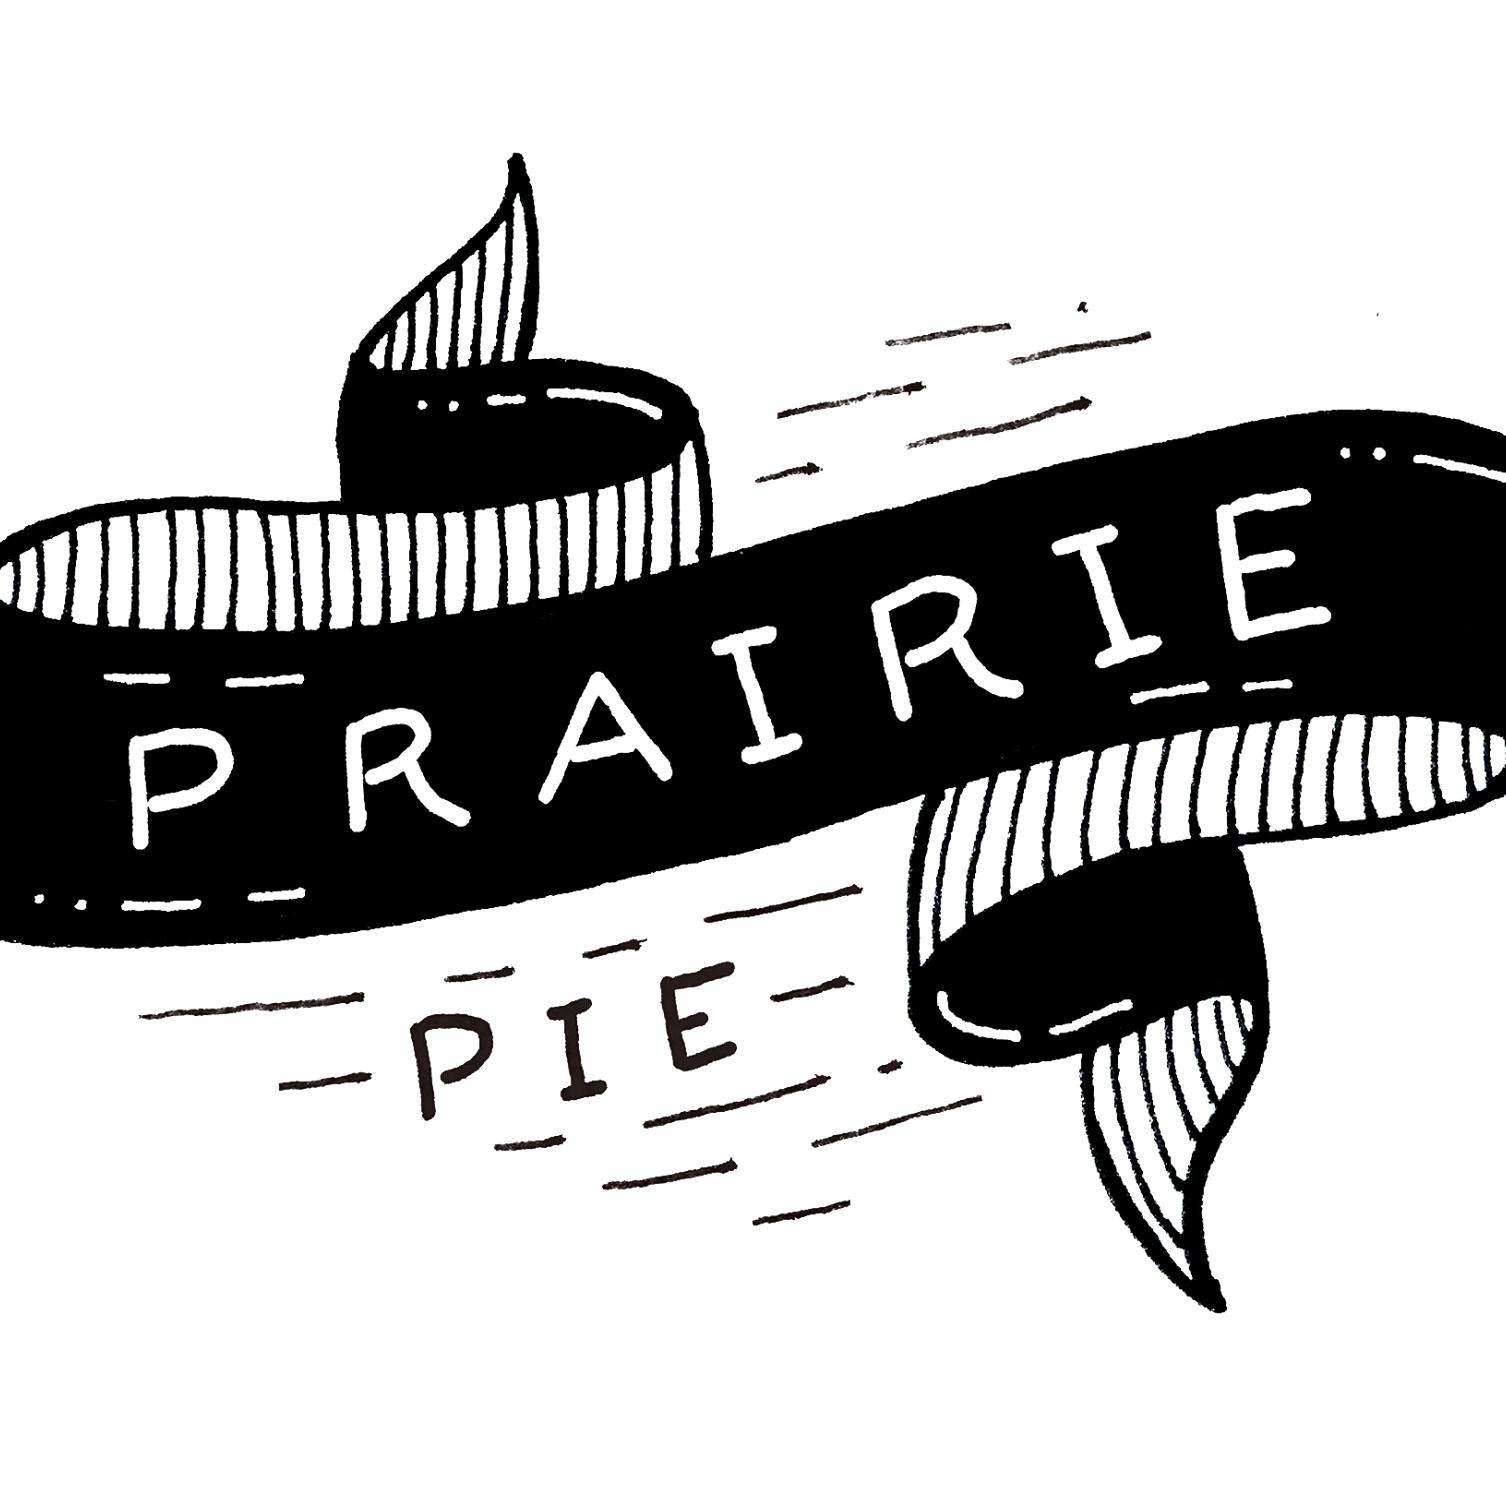 Now serving pies by Prairie Pie! -